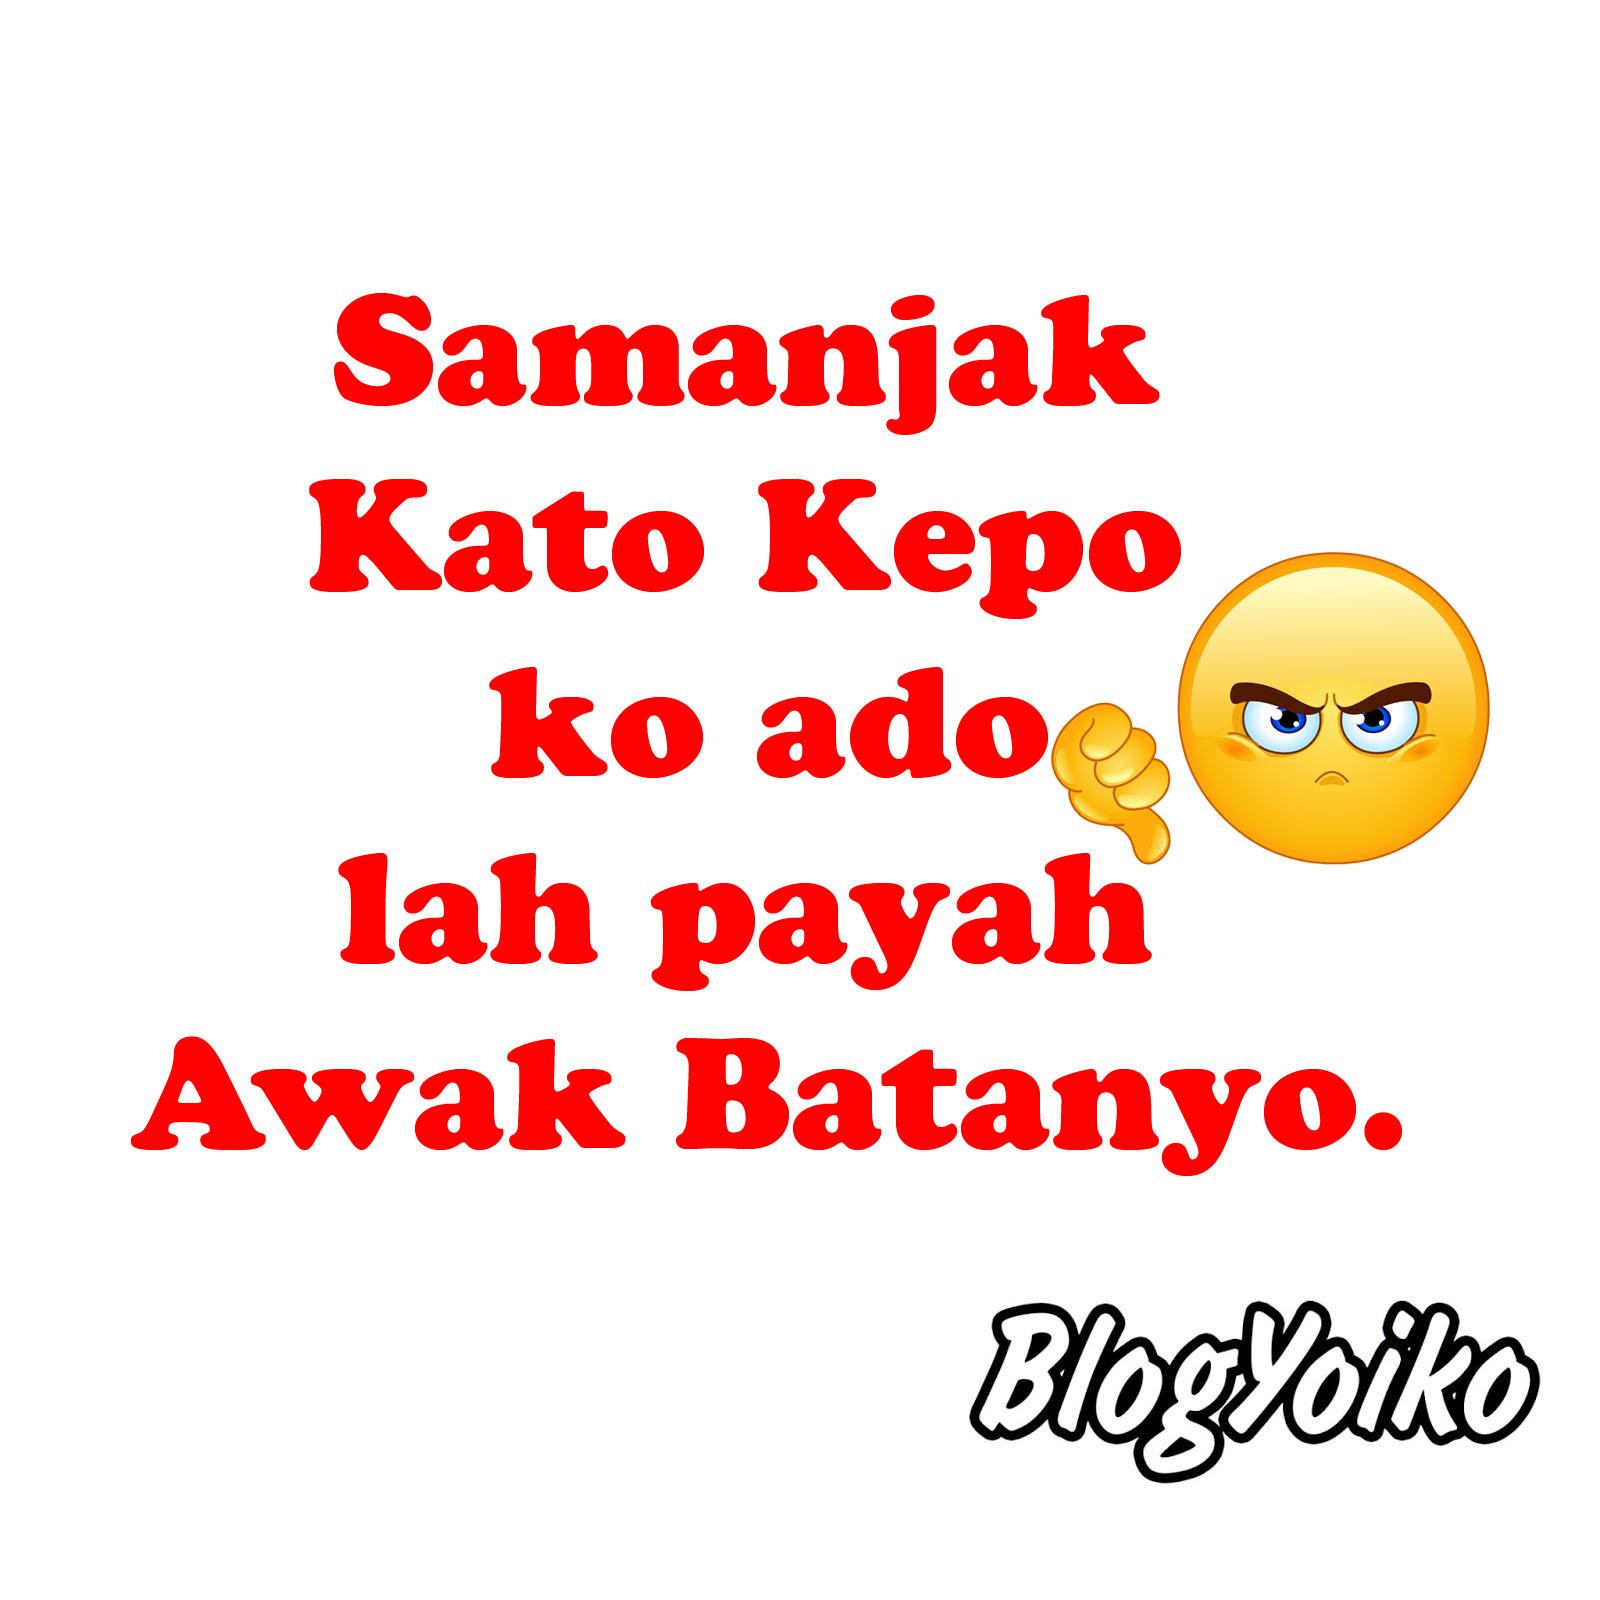 Kata Kata Lucu Bahasa Minang Bahasa Padang Blogyoikocom